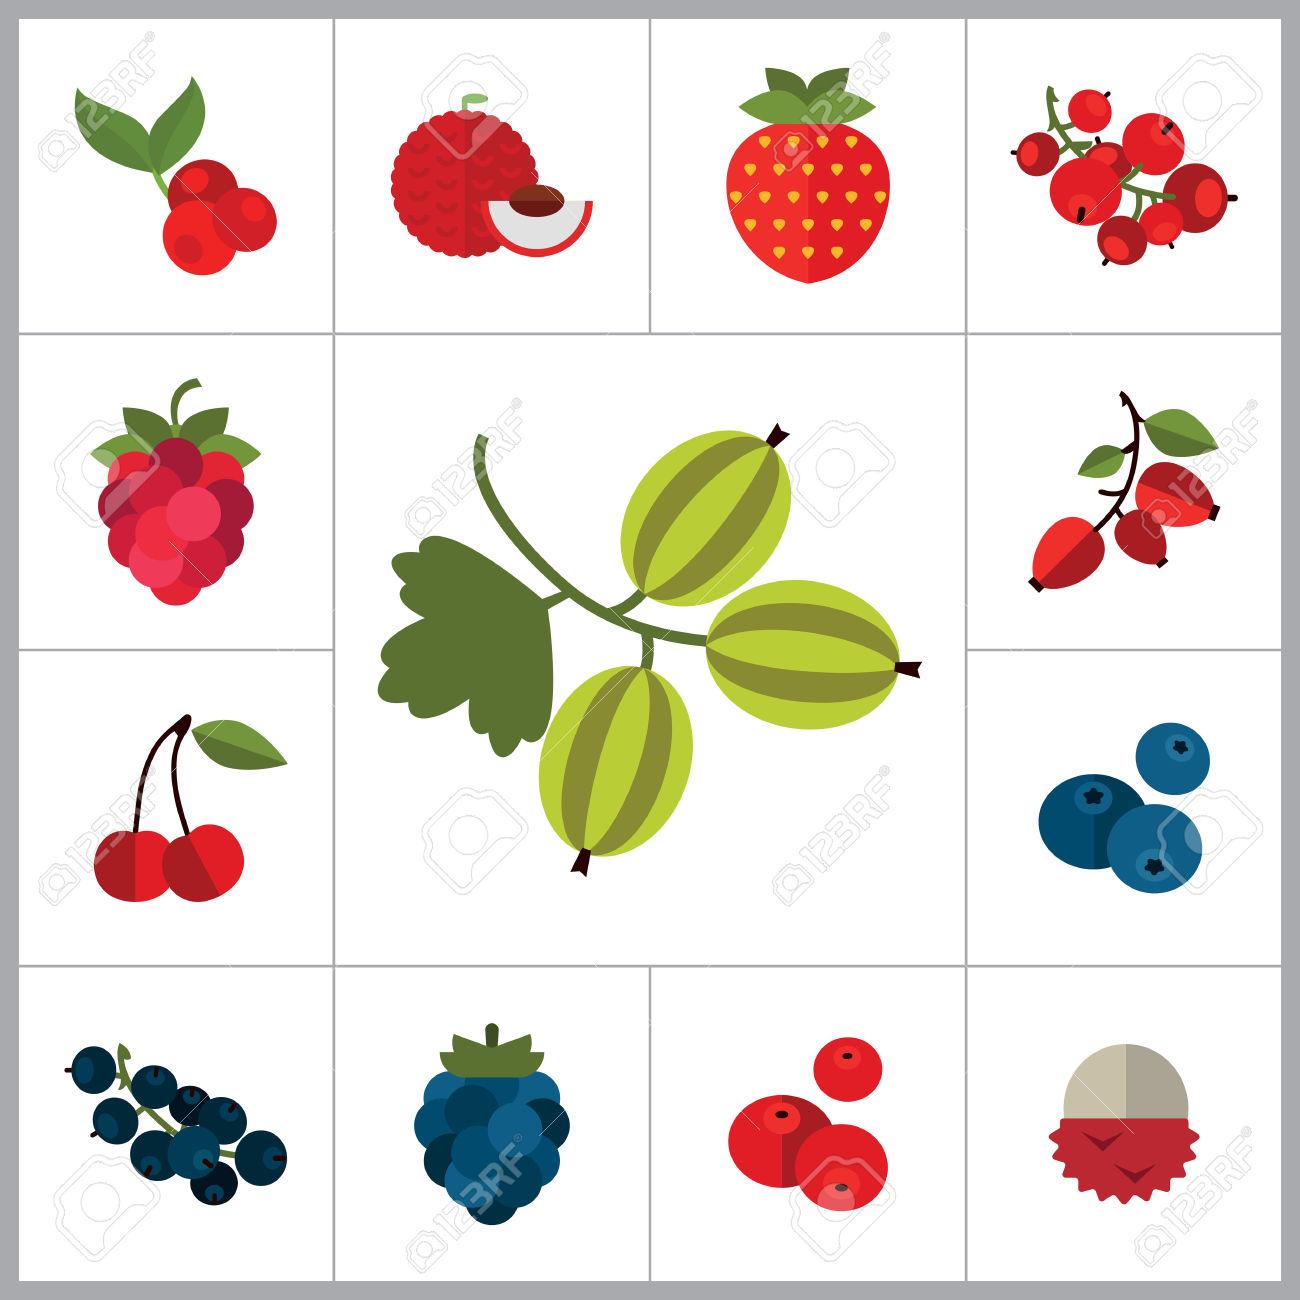 Blueberries clipart cute. Blueberry strawberry blackberry fruit